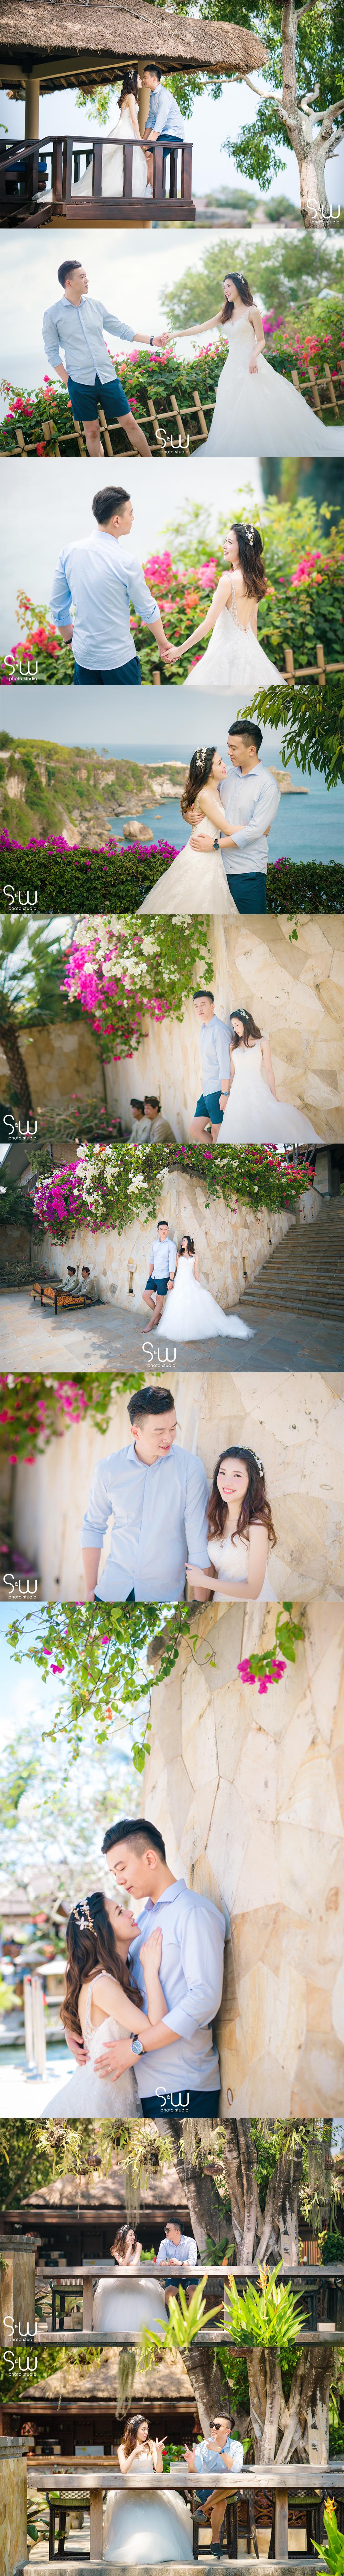 PRE WEDDING | Ayana . BALI (峇里島婚紗) | sw photo studio 婚禮, 婚攝, 婚紗, 海外婚禮, 海外婚紗, 海島婚禮,峇里島婚禮, 峇里島婚紗, 台灣婚禮, 婚攝推薦